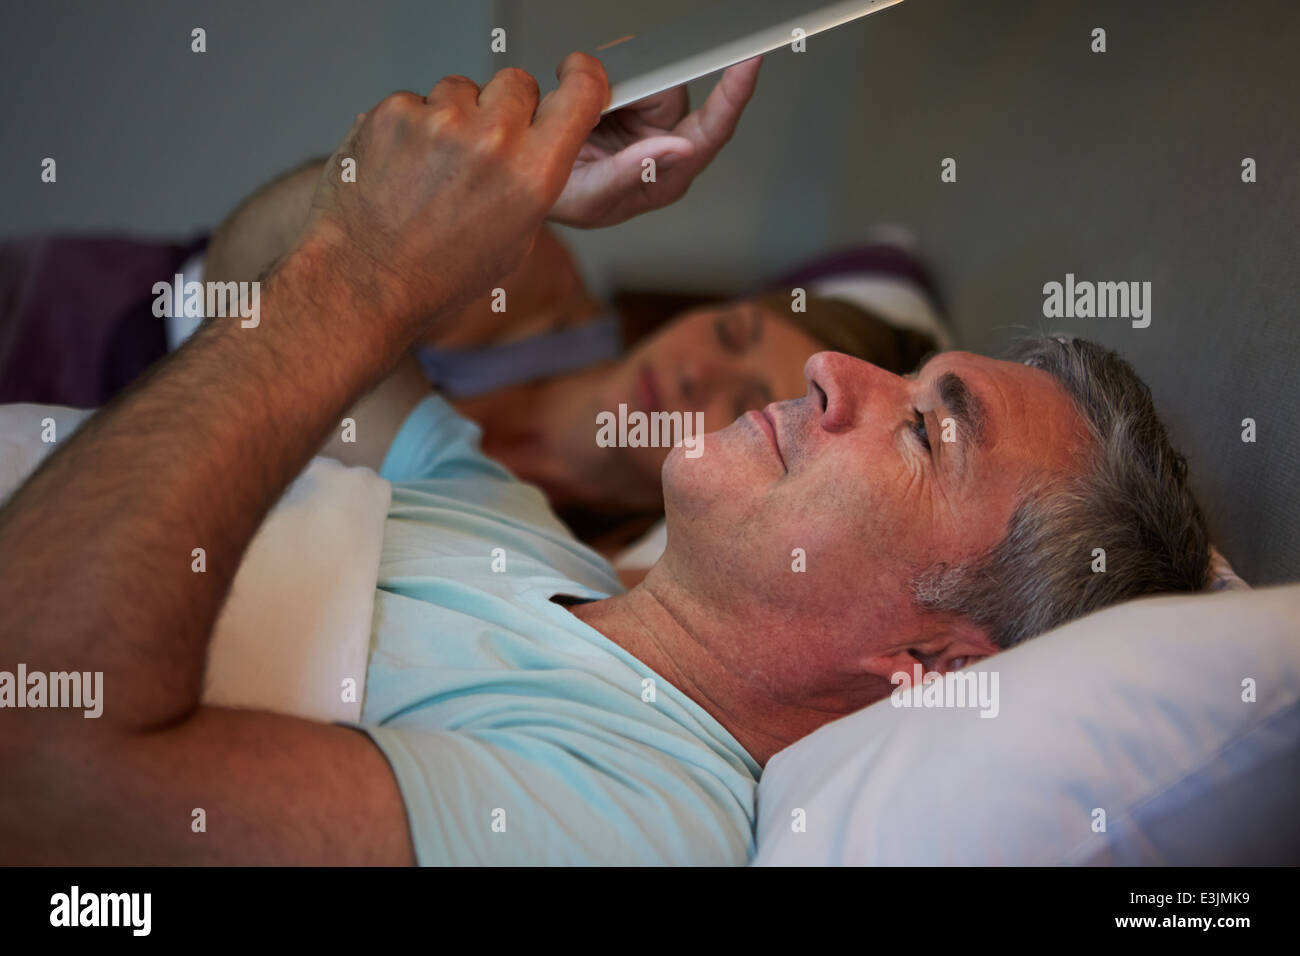 Applying paar im Bett mit Mann mit Tablet-PC Stockbild